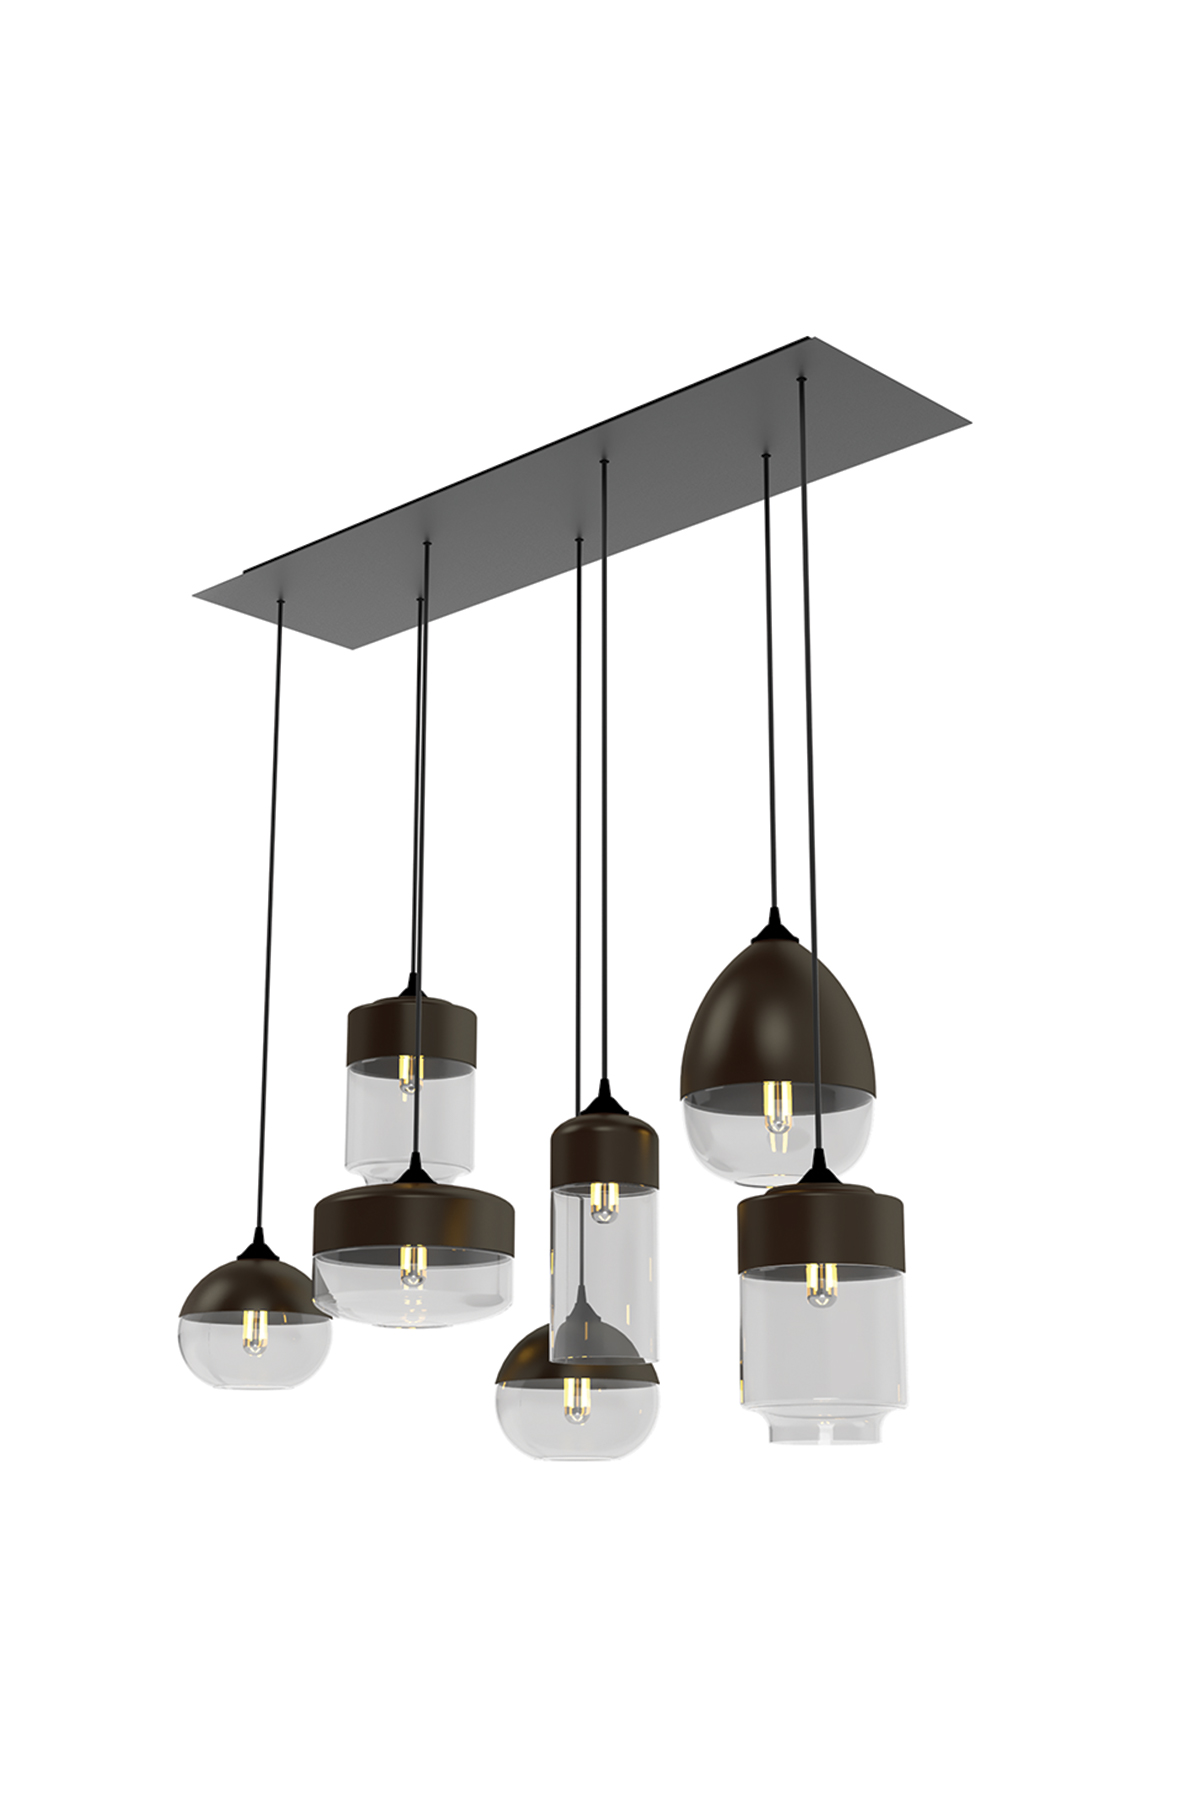 7 Light Rectangular Multi-Pendant Canopy - Product Spec Sheet ↓